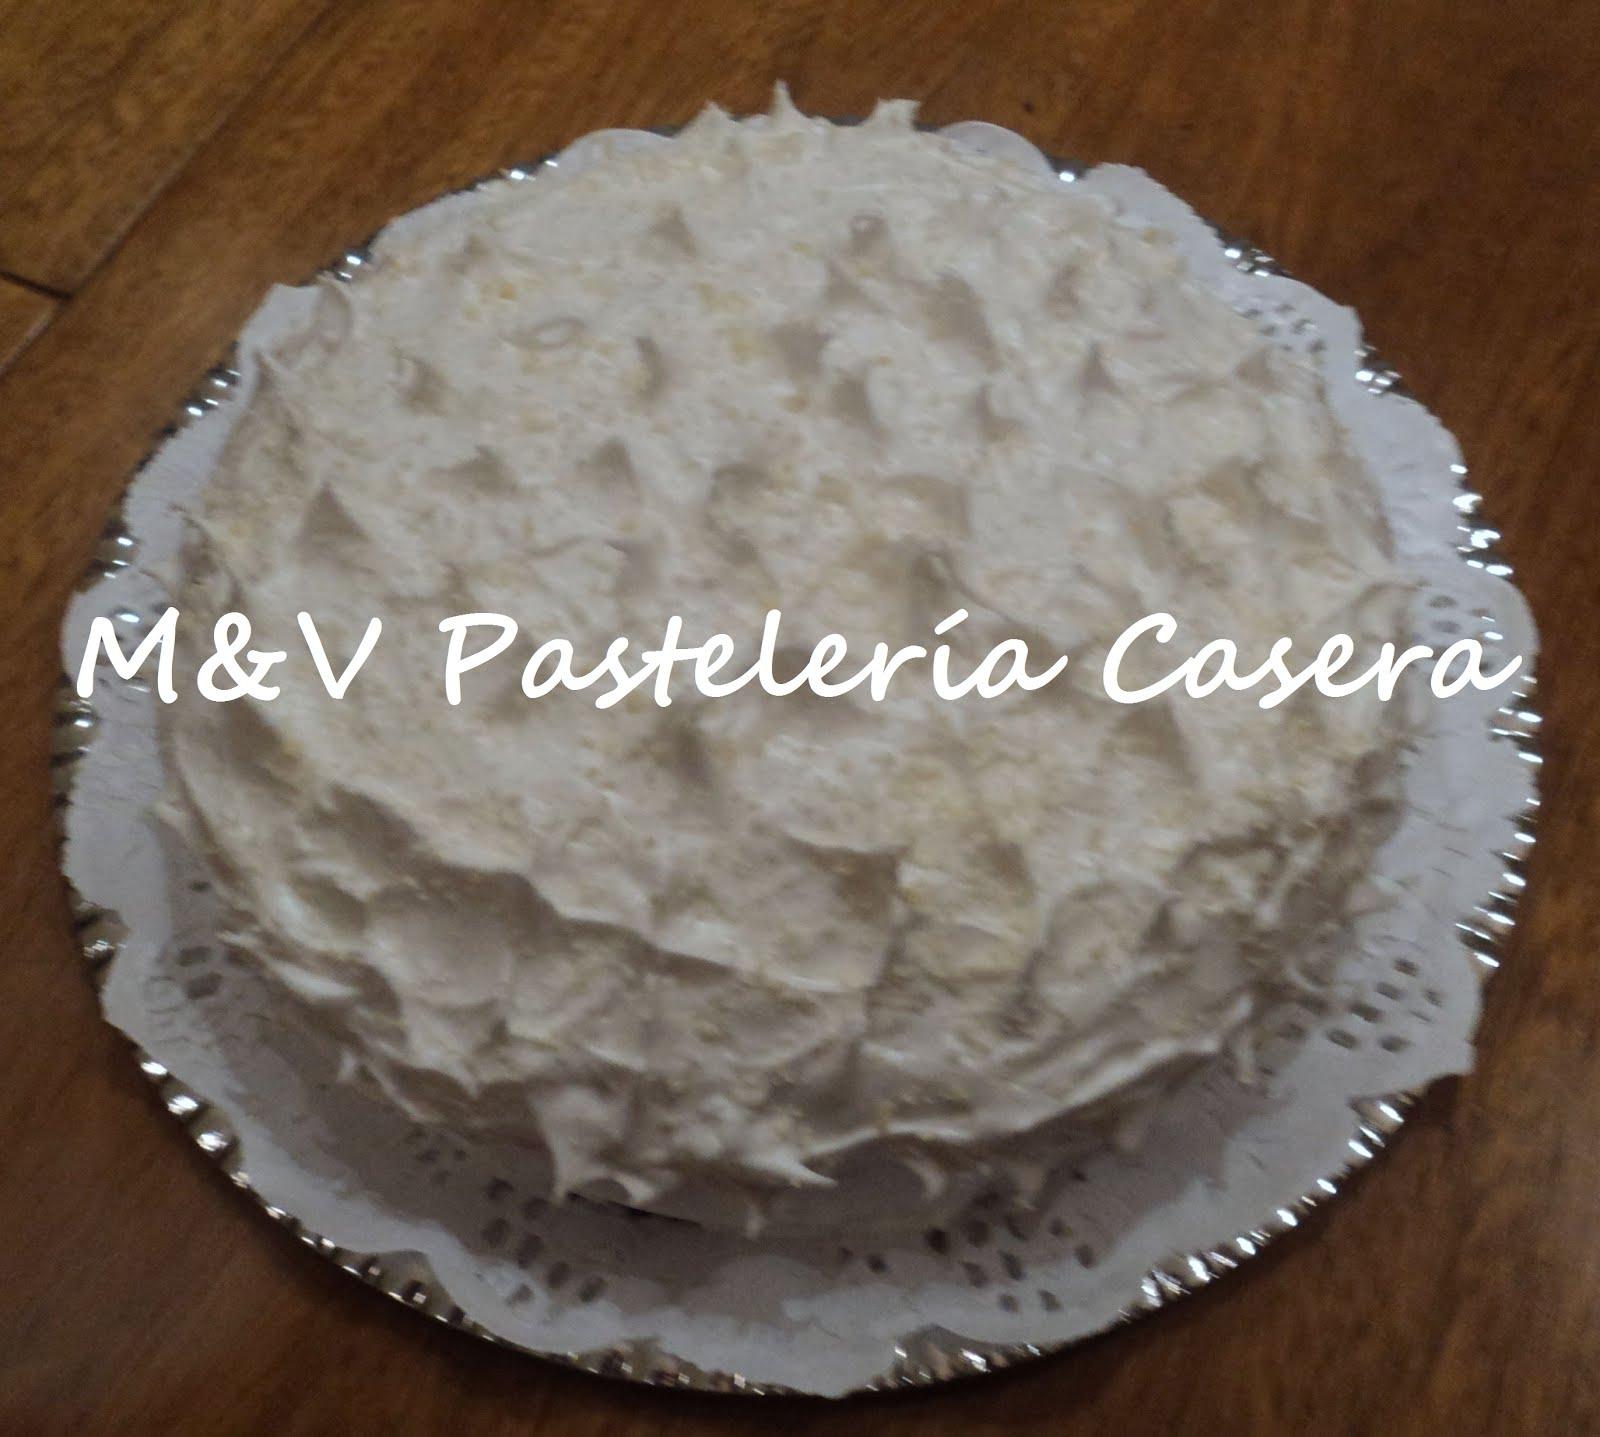 Baño Chocolate Blanco Para Tortas:Torta Nevada: Base húmeda de chocolate, dulce de leche, mousse de